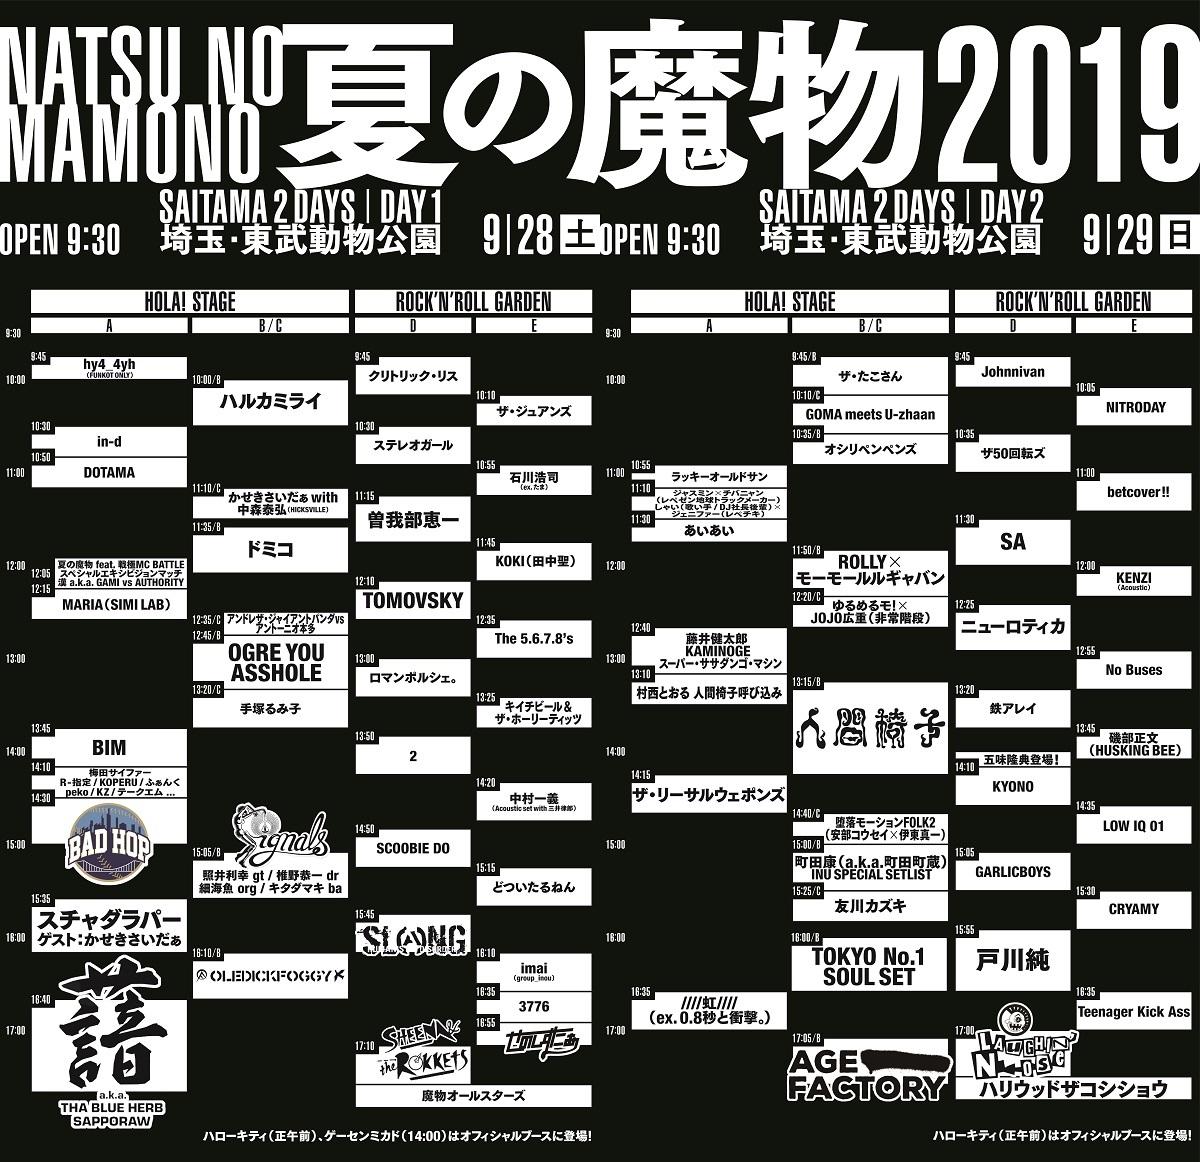 TBSラジオ主催 夏の魔物2019 in SAITAMA 2DAYS